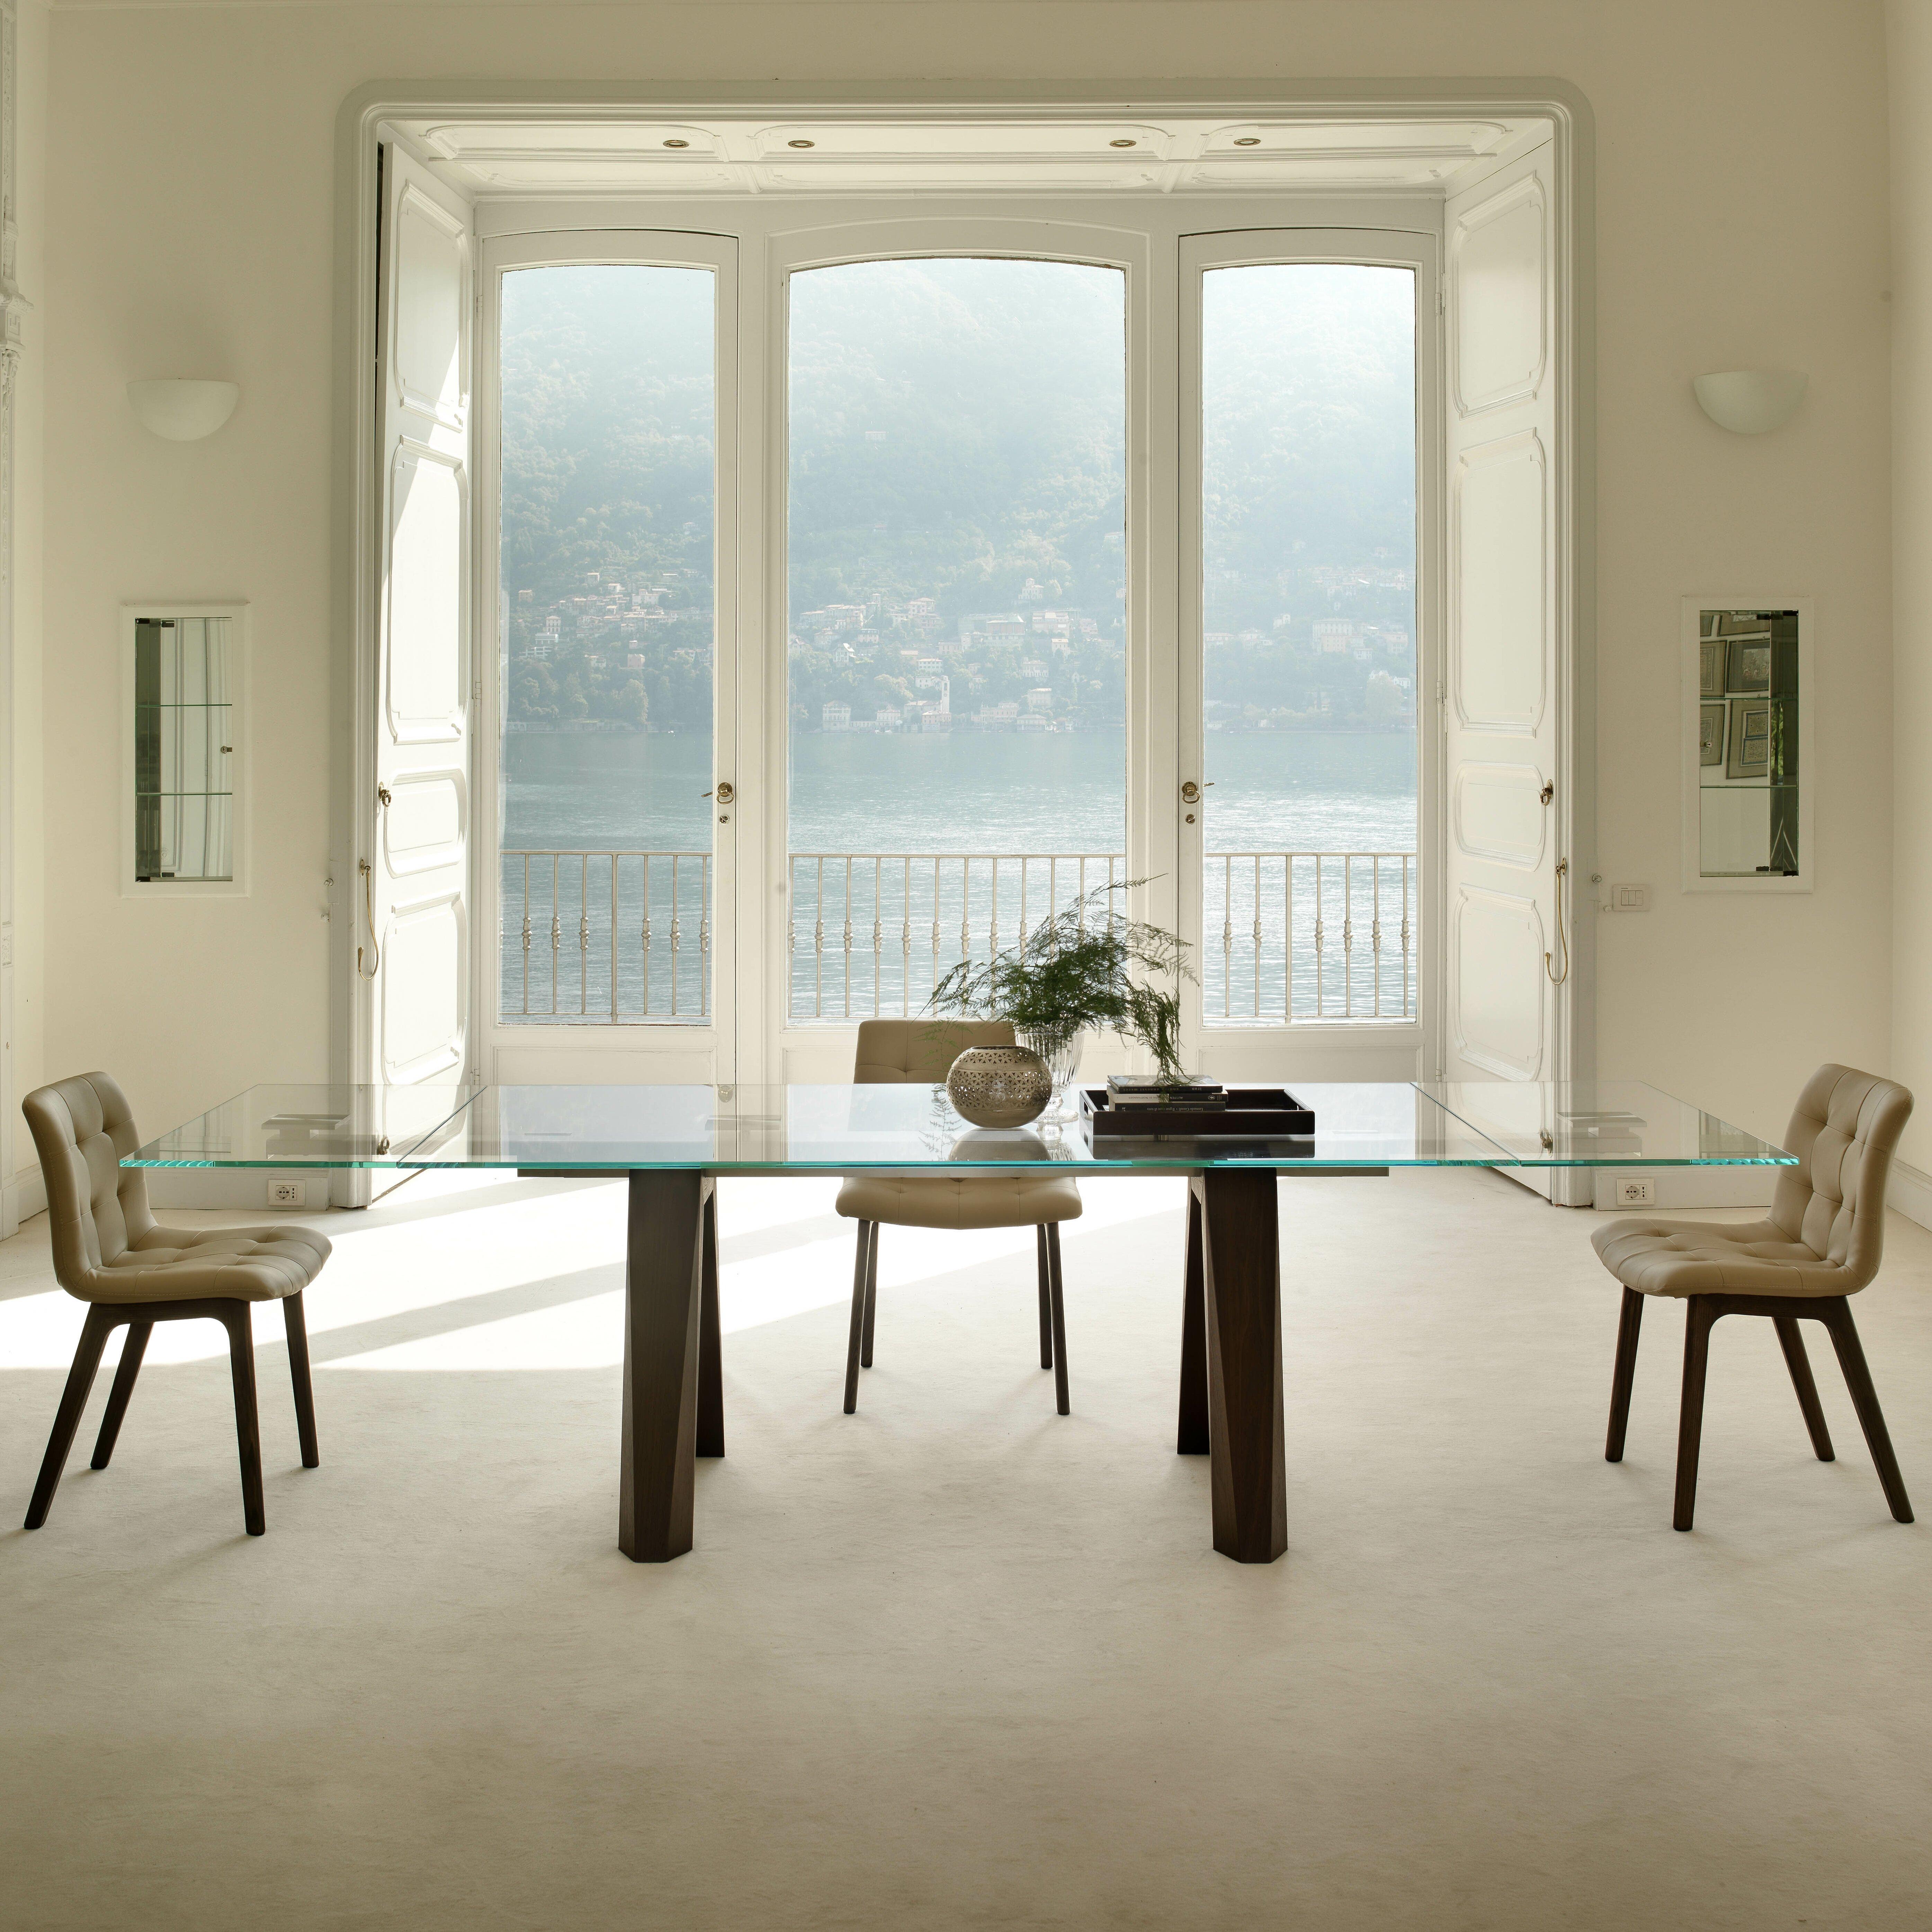 bontempi casa aron extendable dining table reviews wayfair. Black Bedroom Furniture Sets. Home Design Ideas